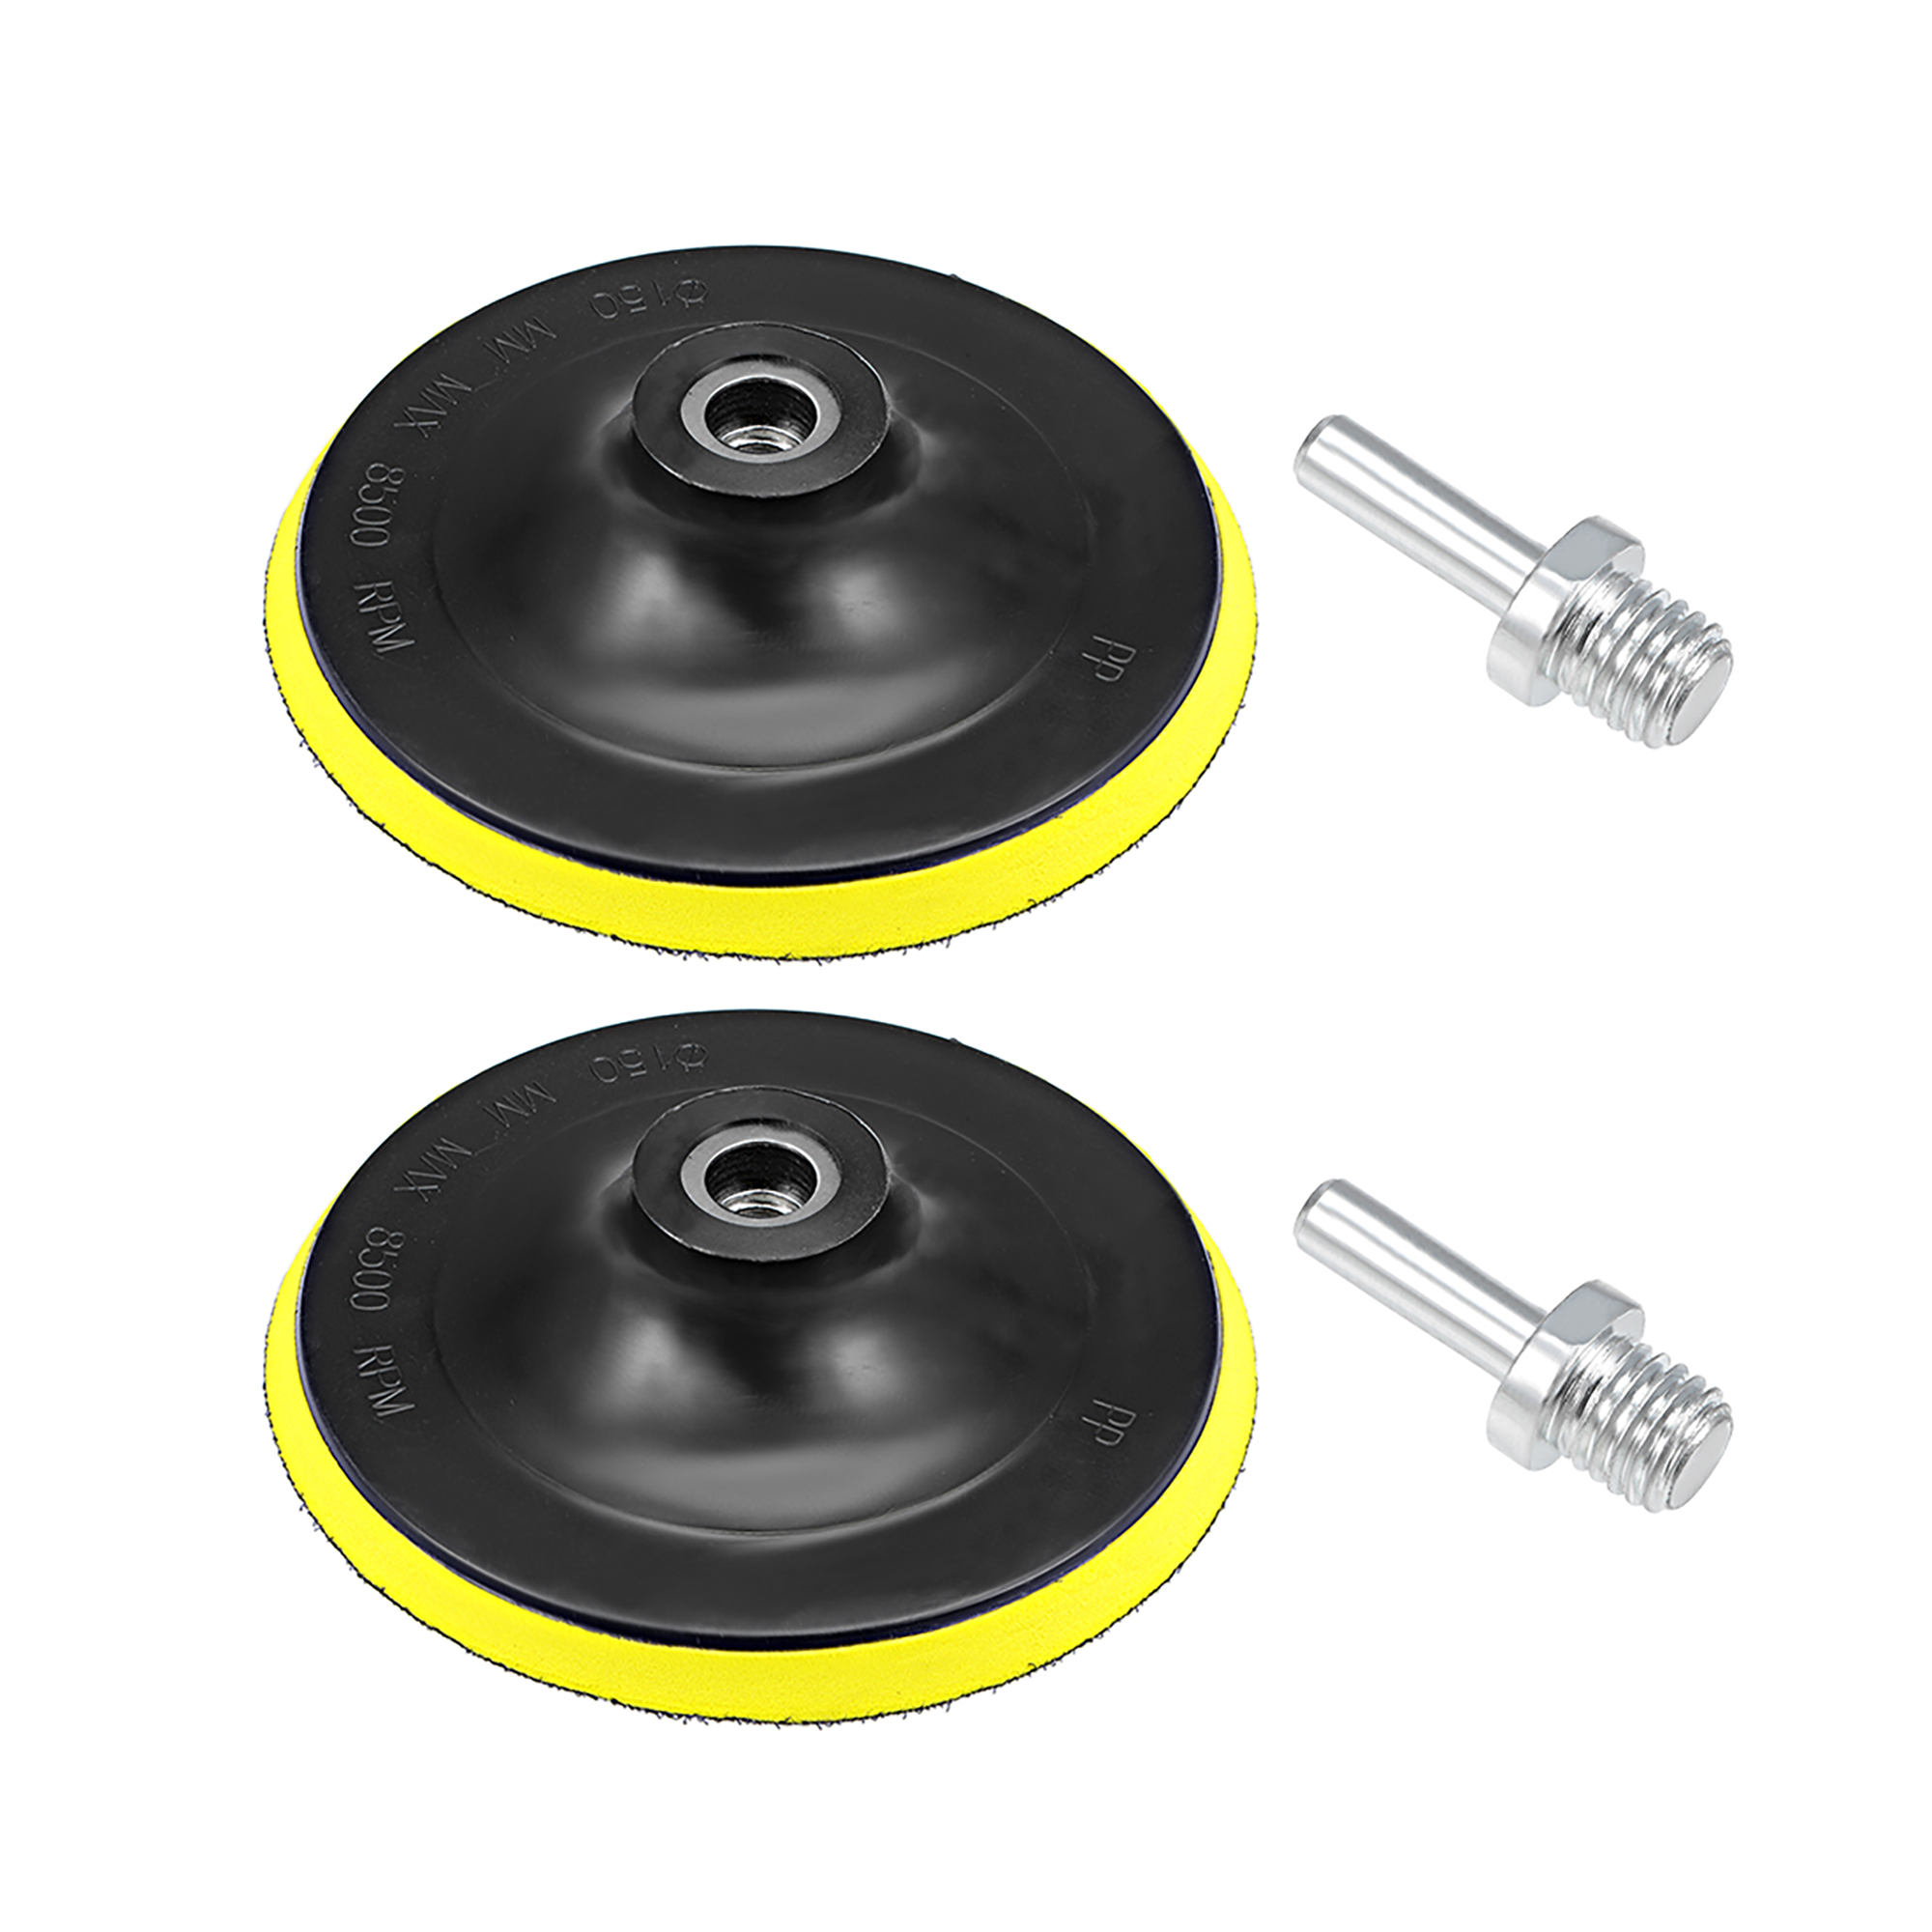 62pc 50mm Sanding Disc Sand Paper Hook Loop Sander+Backer Pad+M6 Drill Adapter